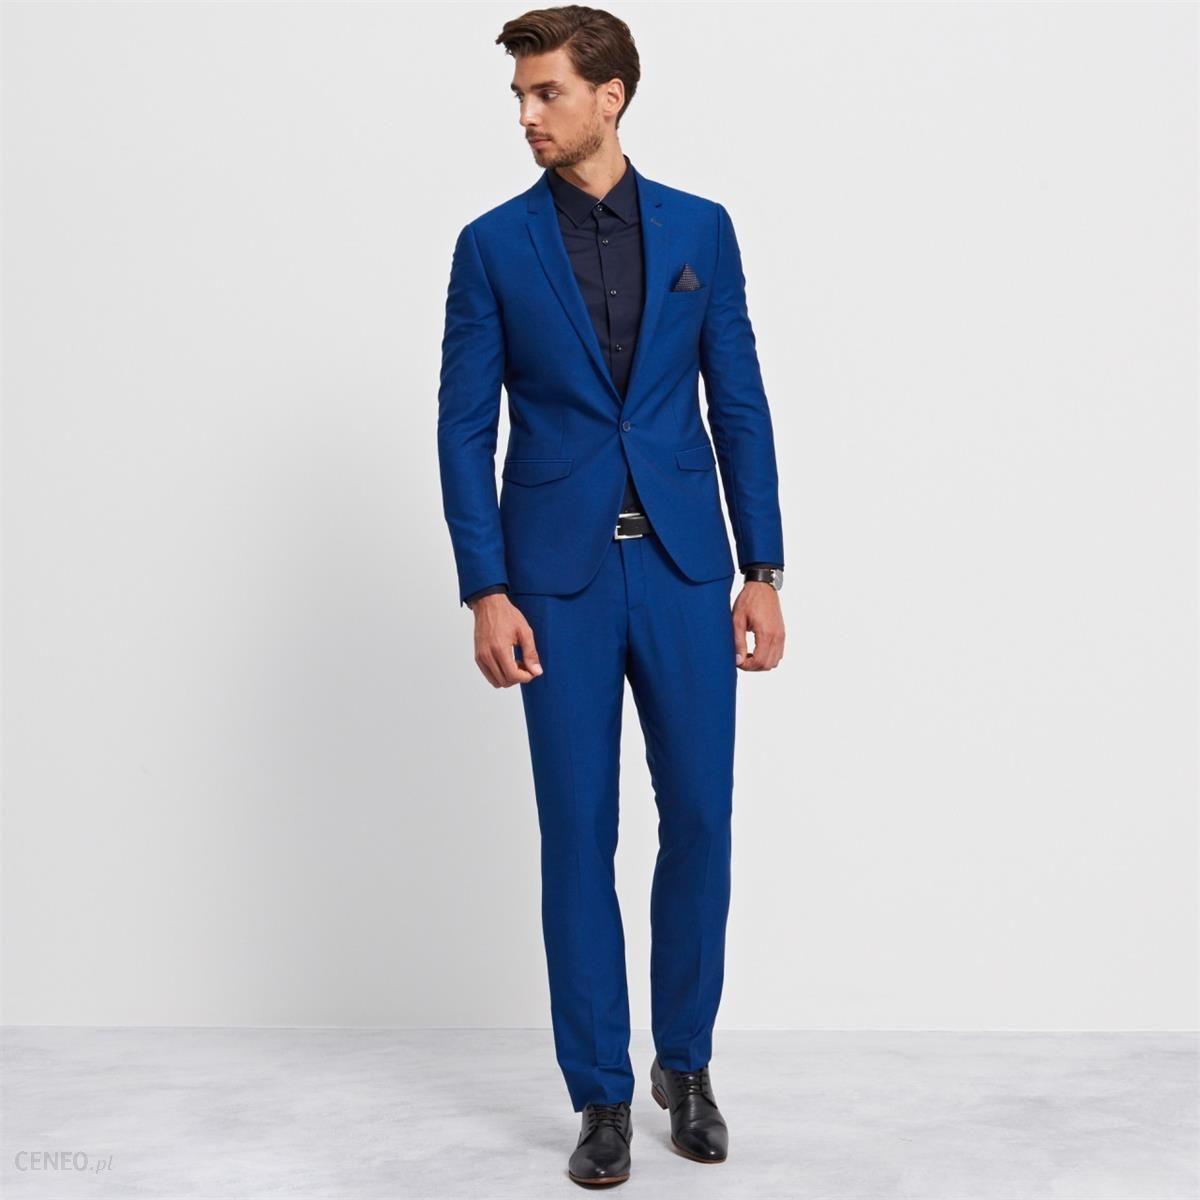 fcbc94ca5660d Spodnie od garnituru slim fit - Reserved - Niebieski - męska - zdjęcie 1